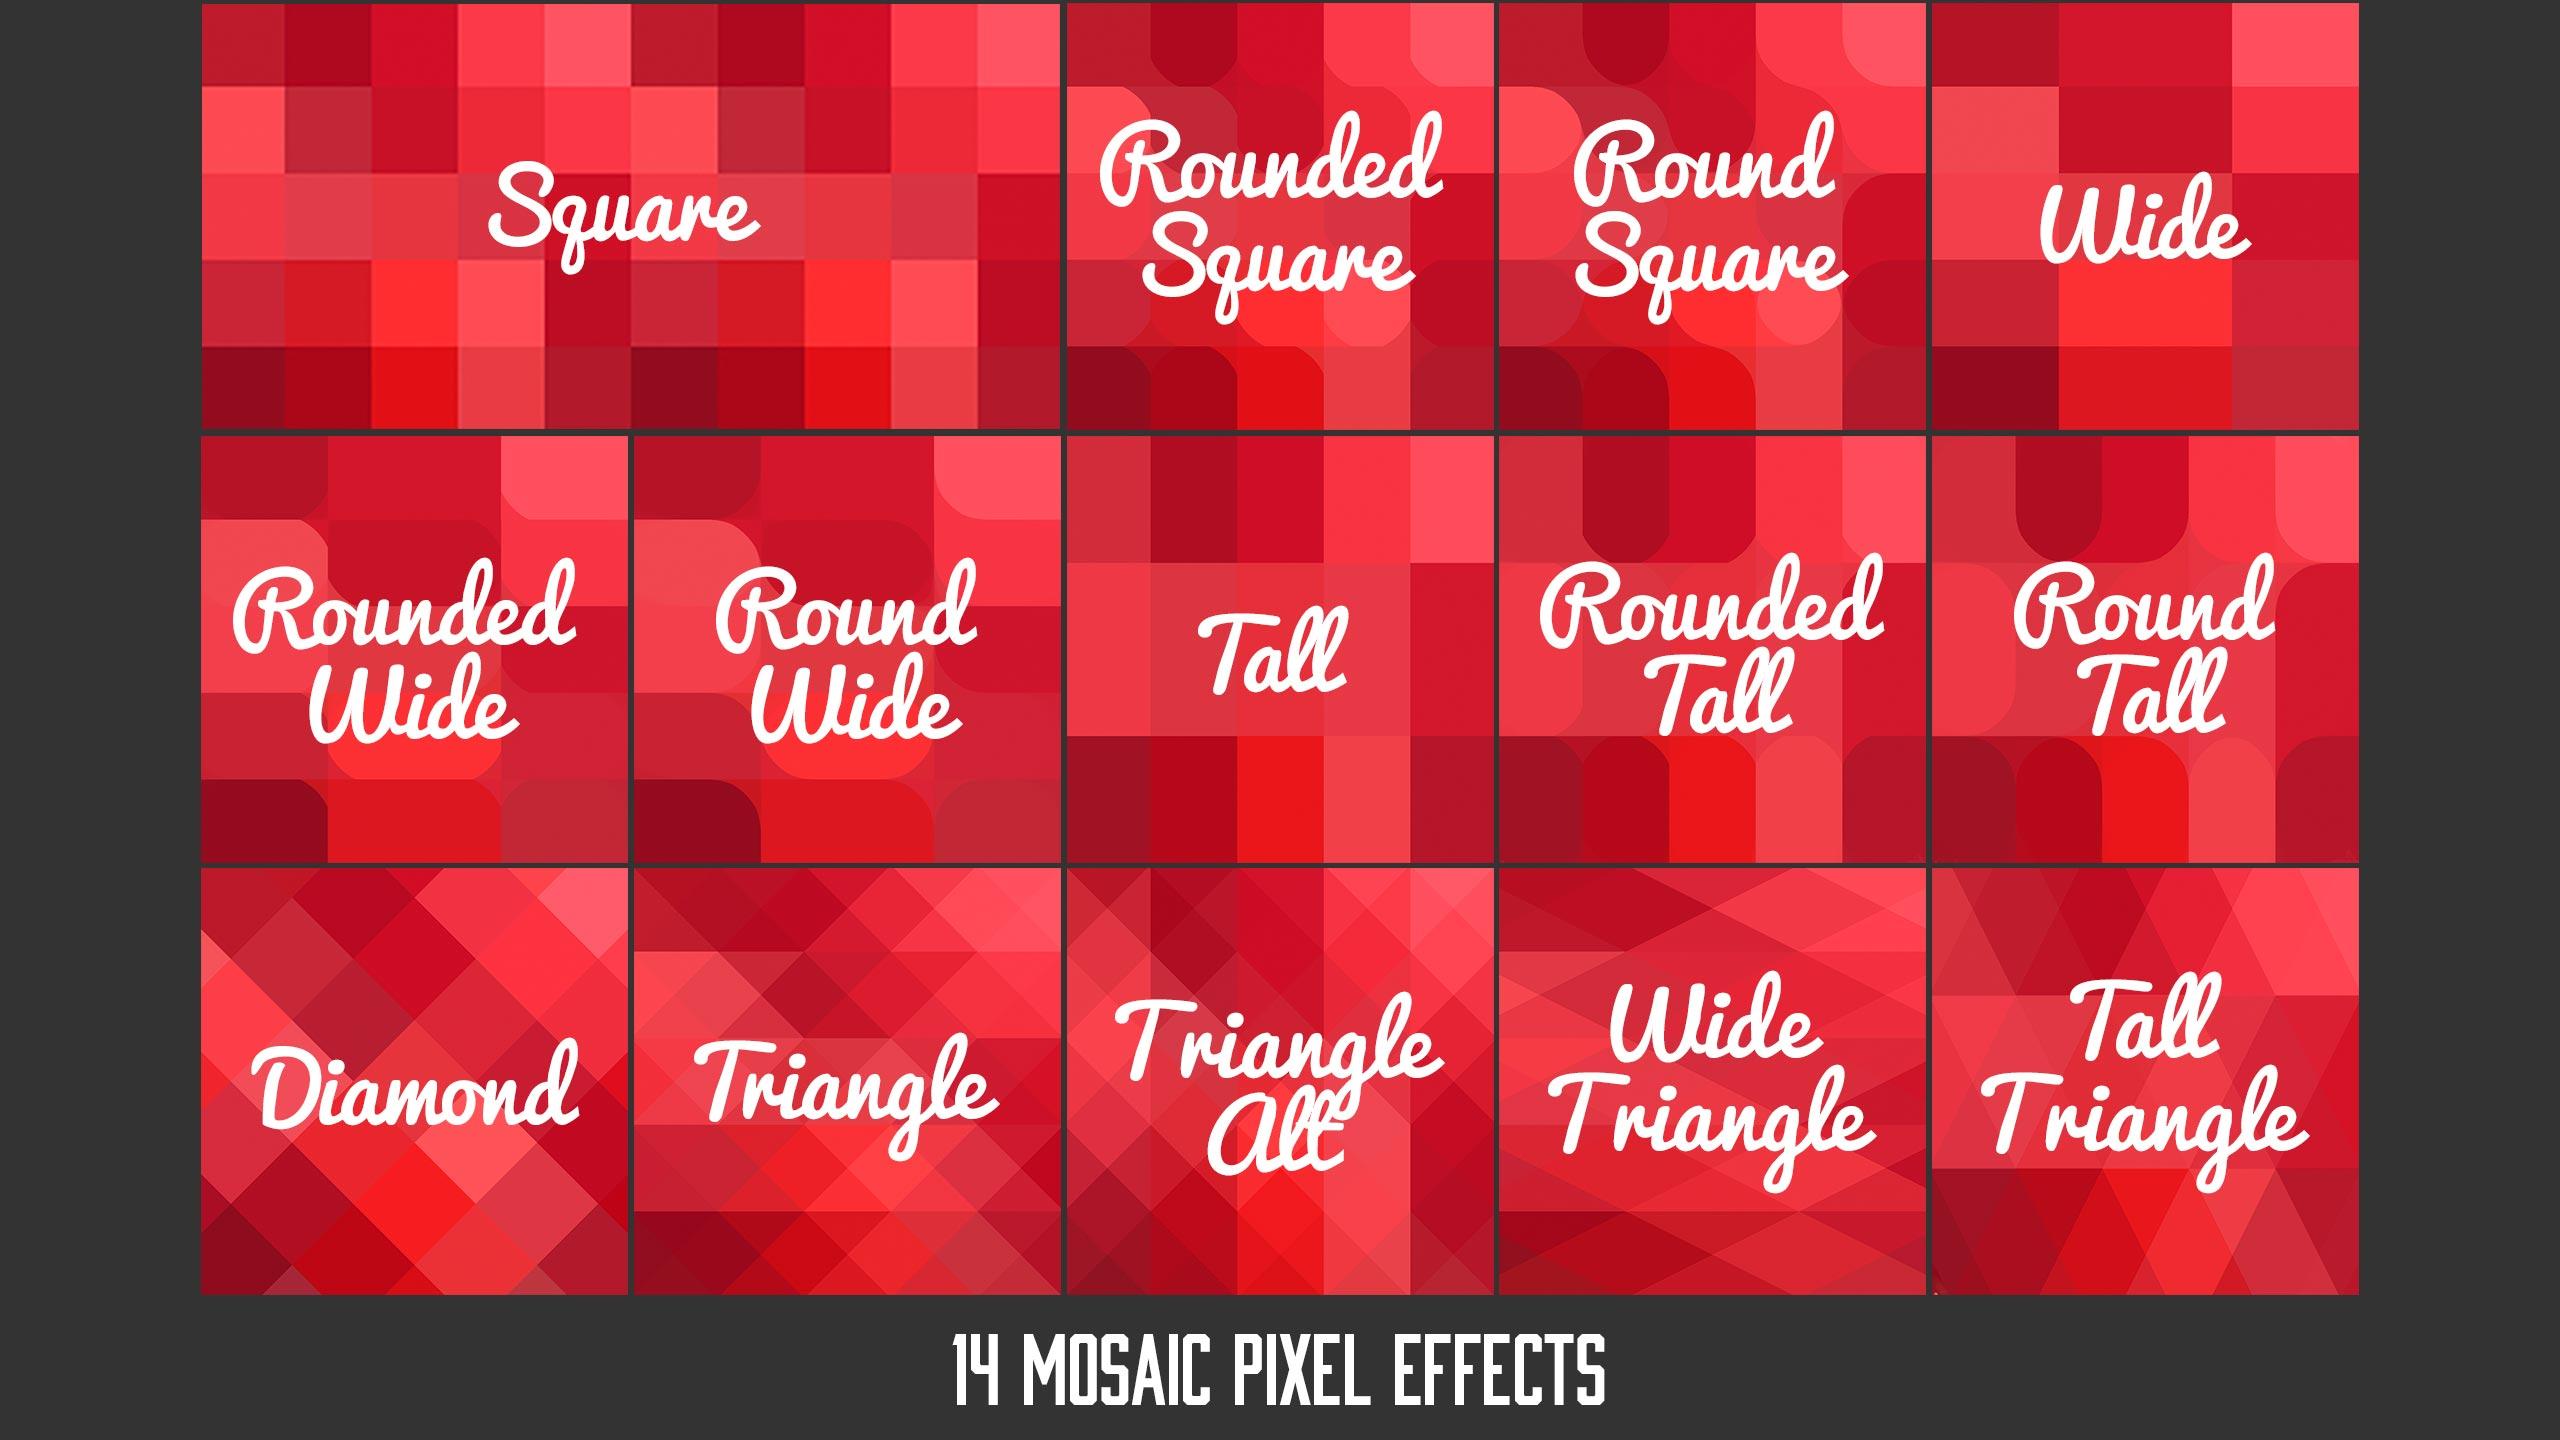 Pixelator 14 Mosaic Effects